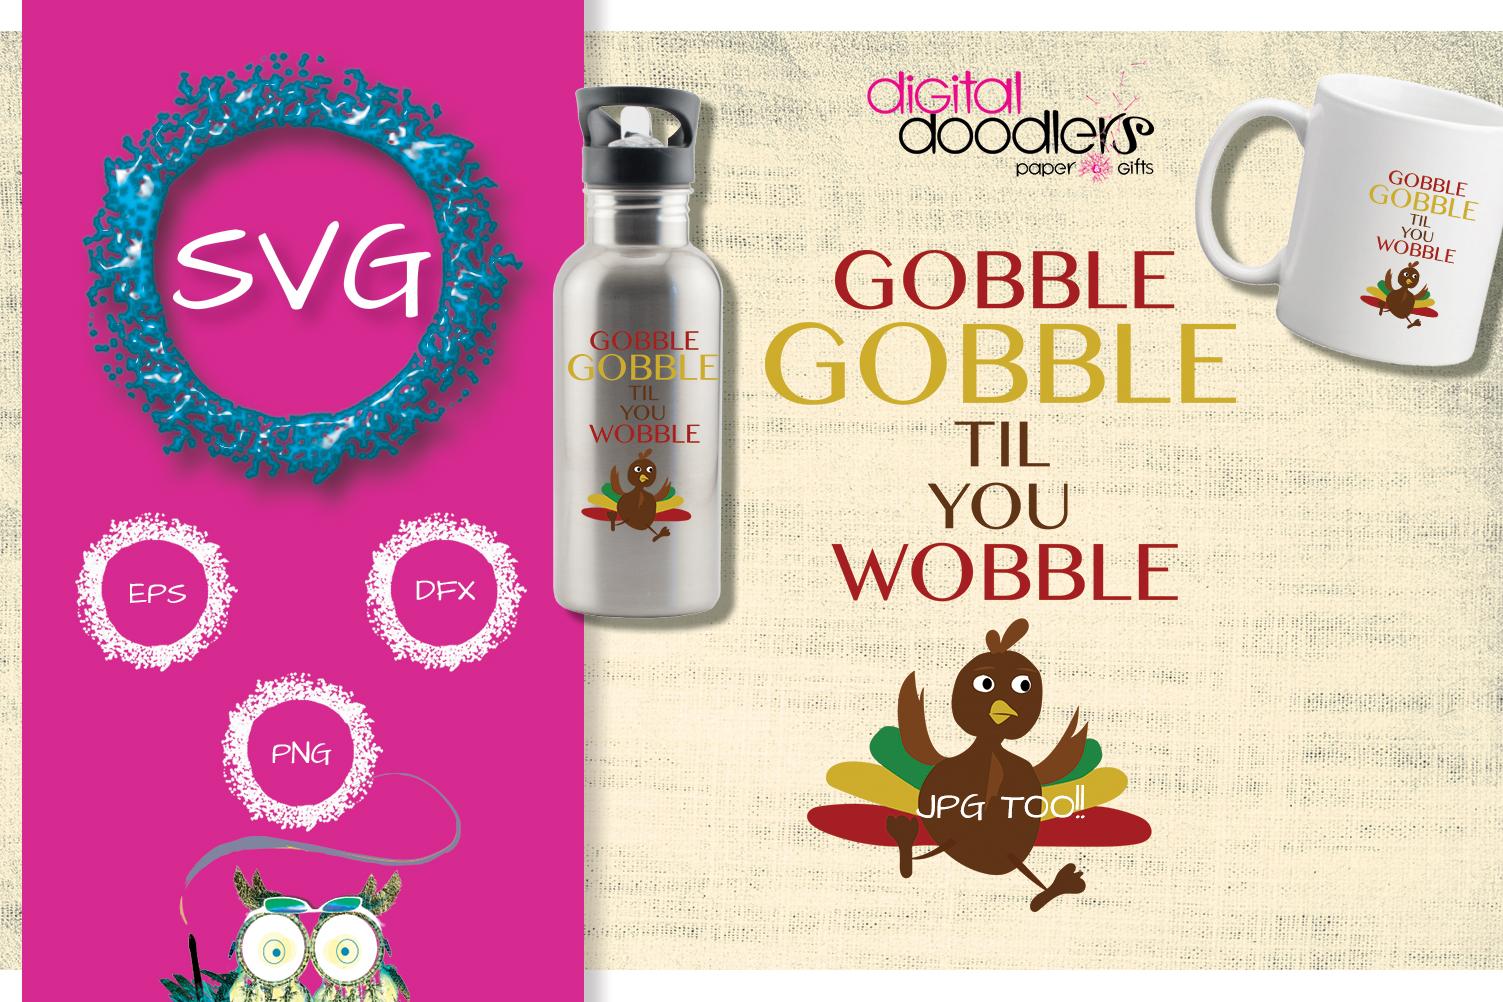 Gobble Gobble Til You Wobble example image 3